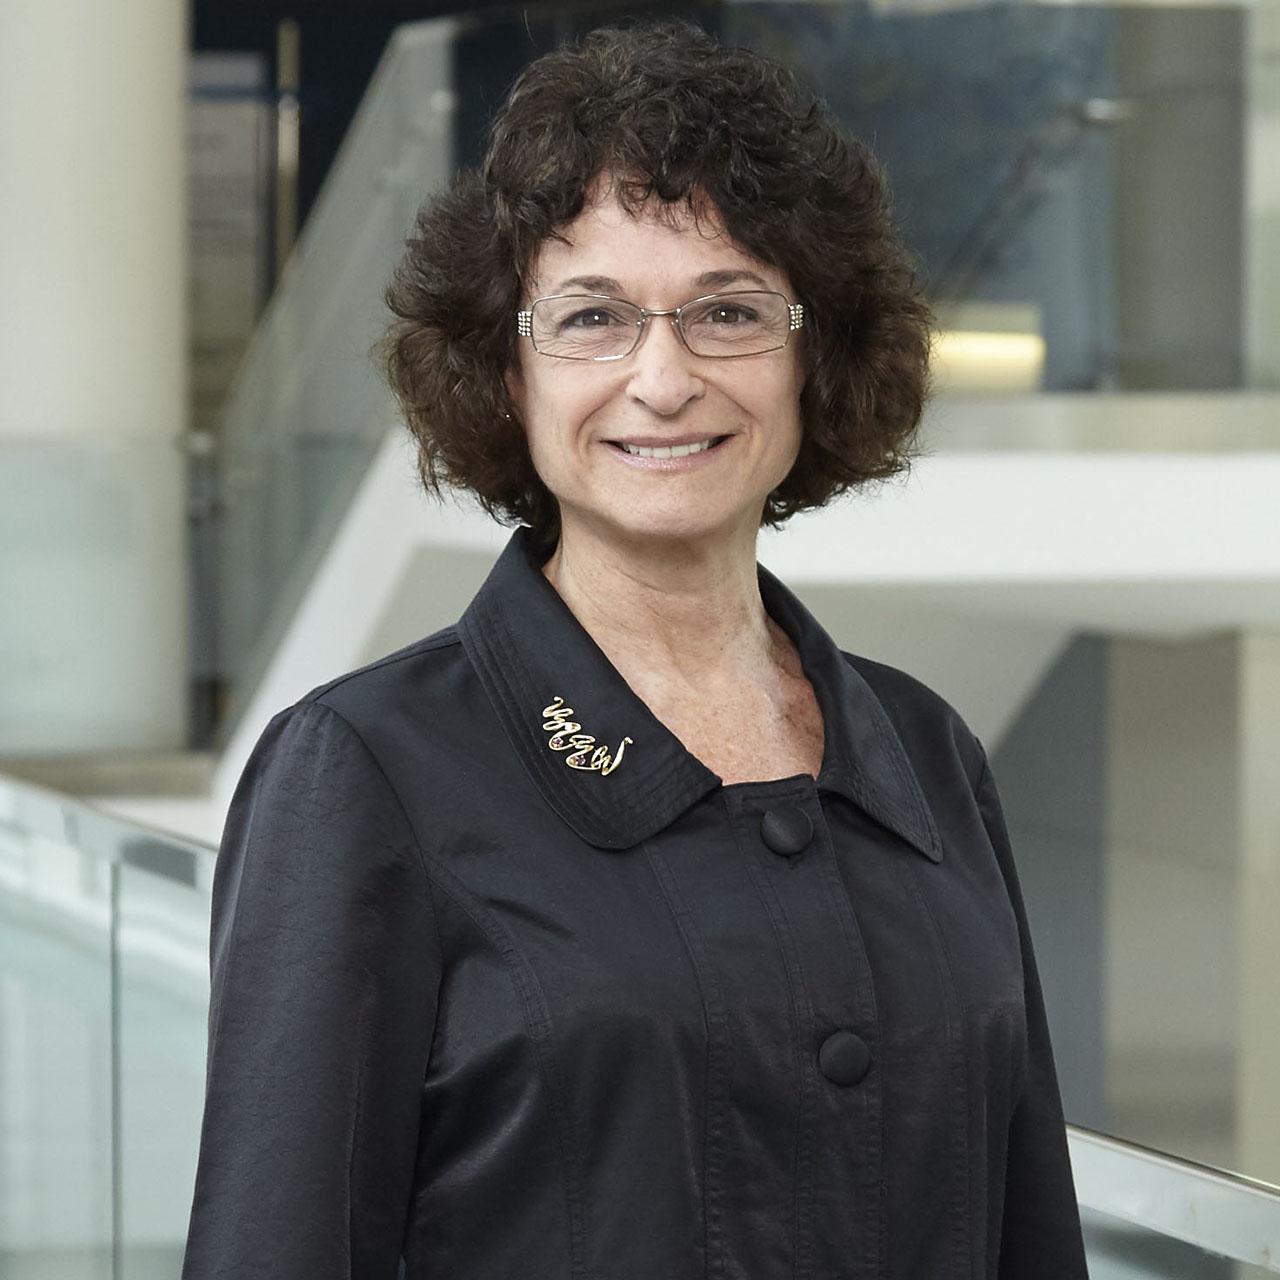 Dr. Cheryl Gaimon